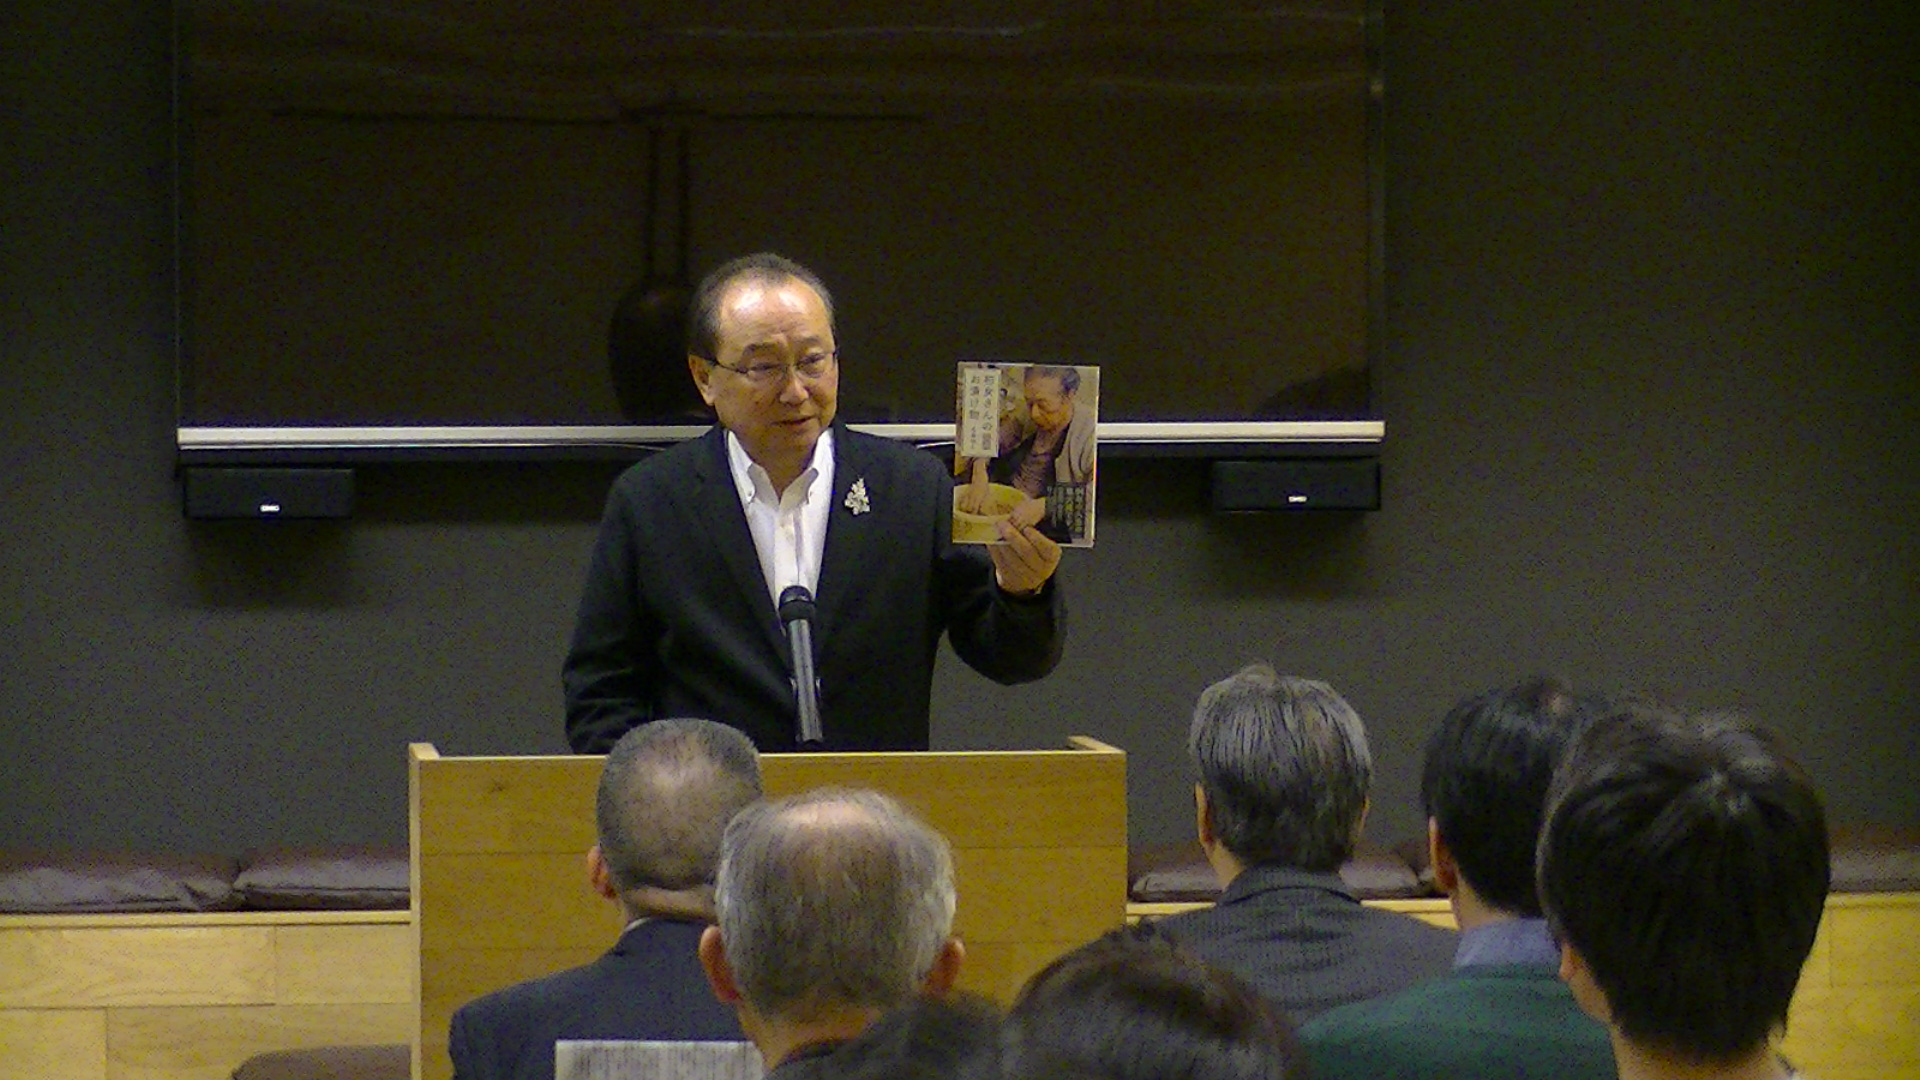 PIC 0689 - 4月1日東京思風塾の開催になります。